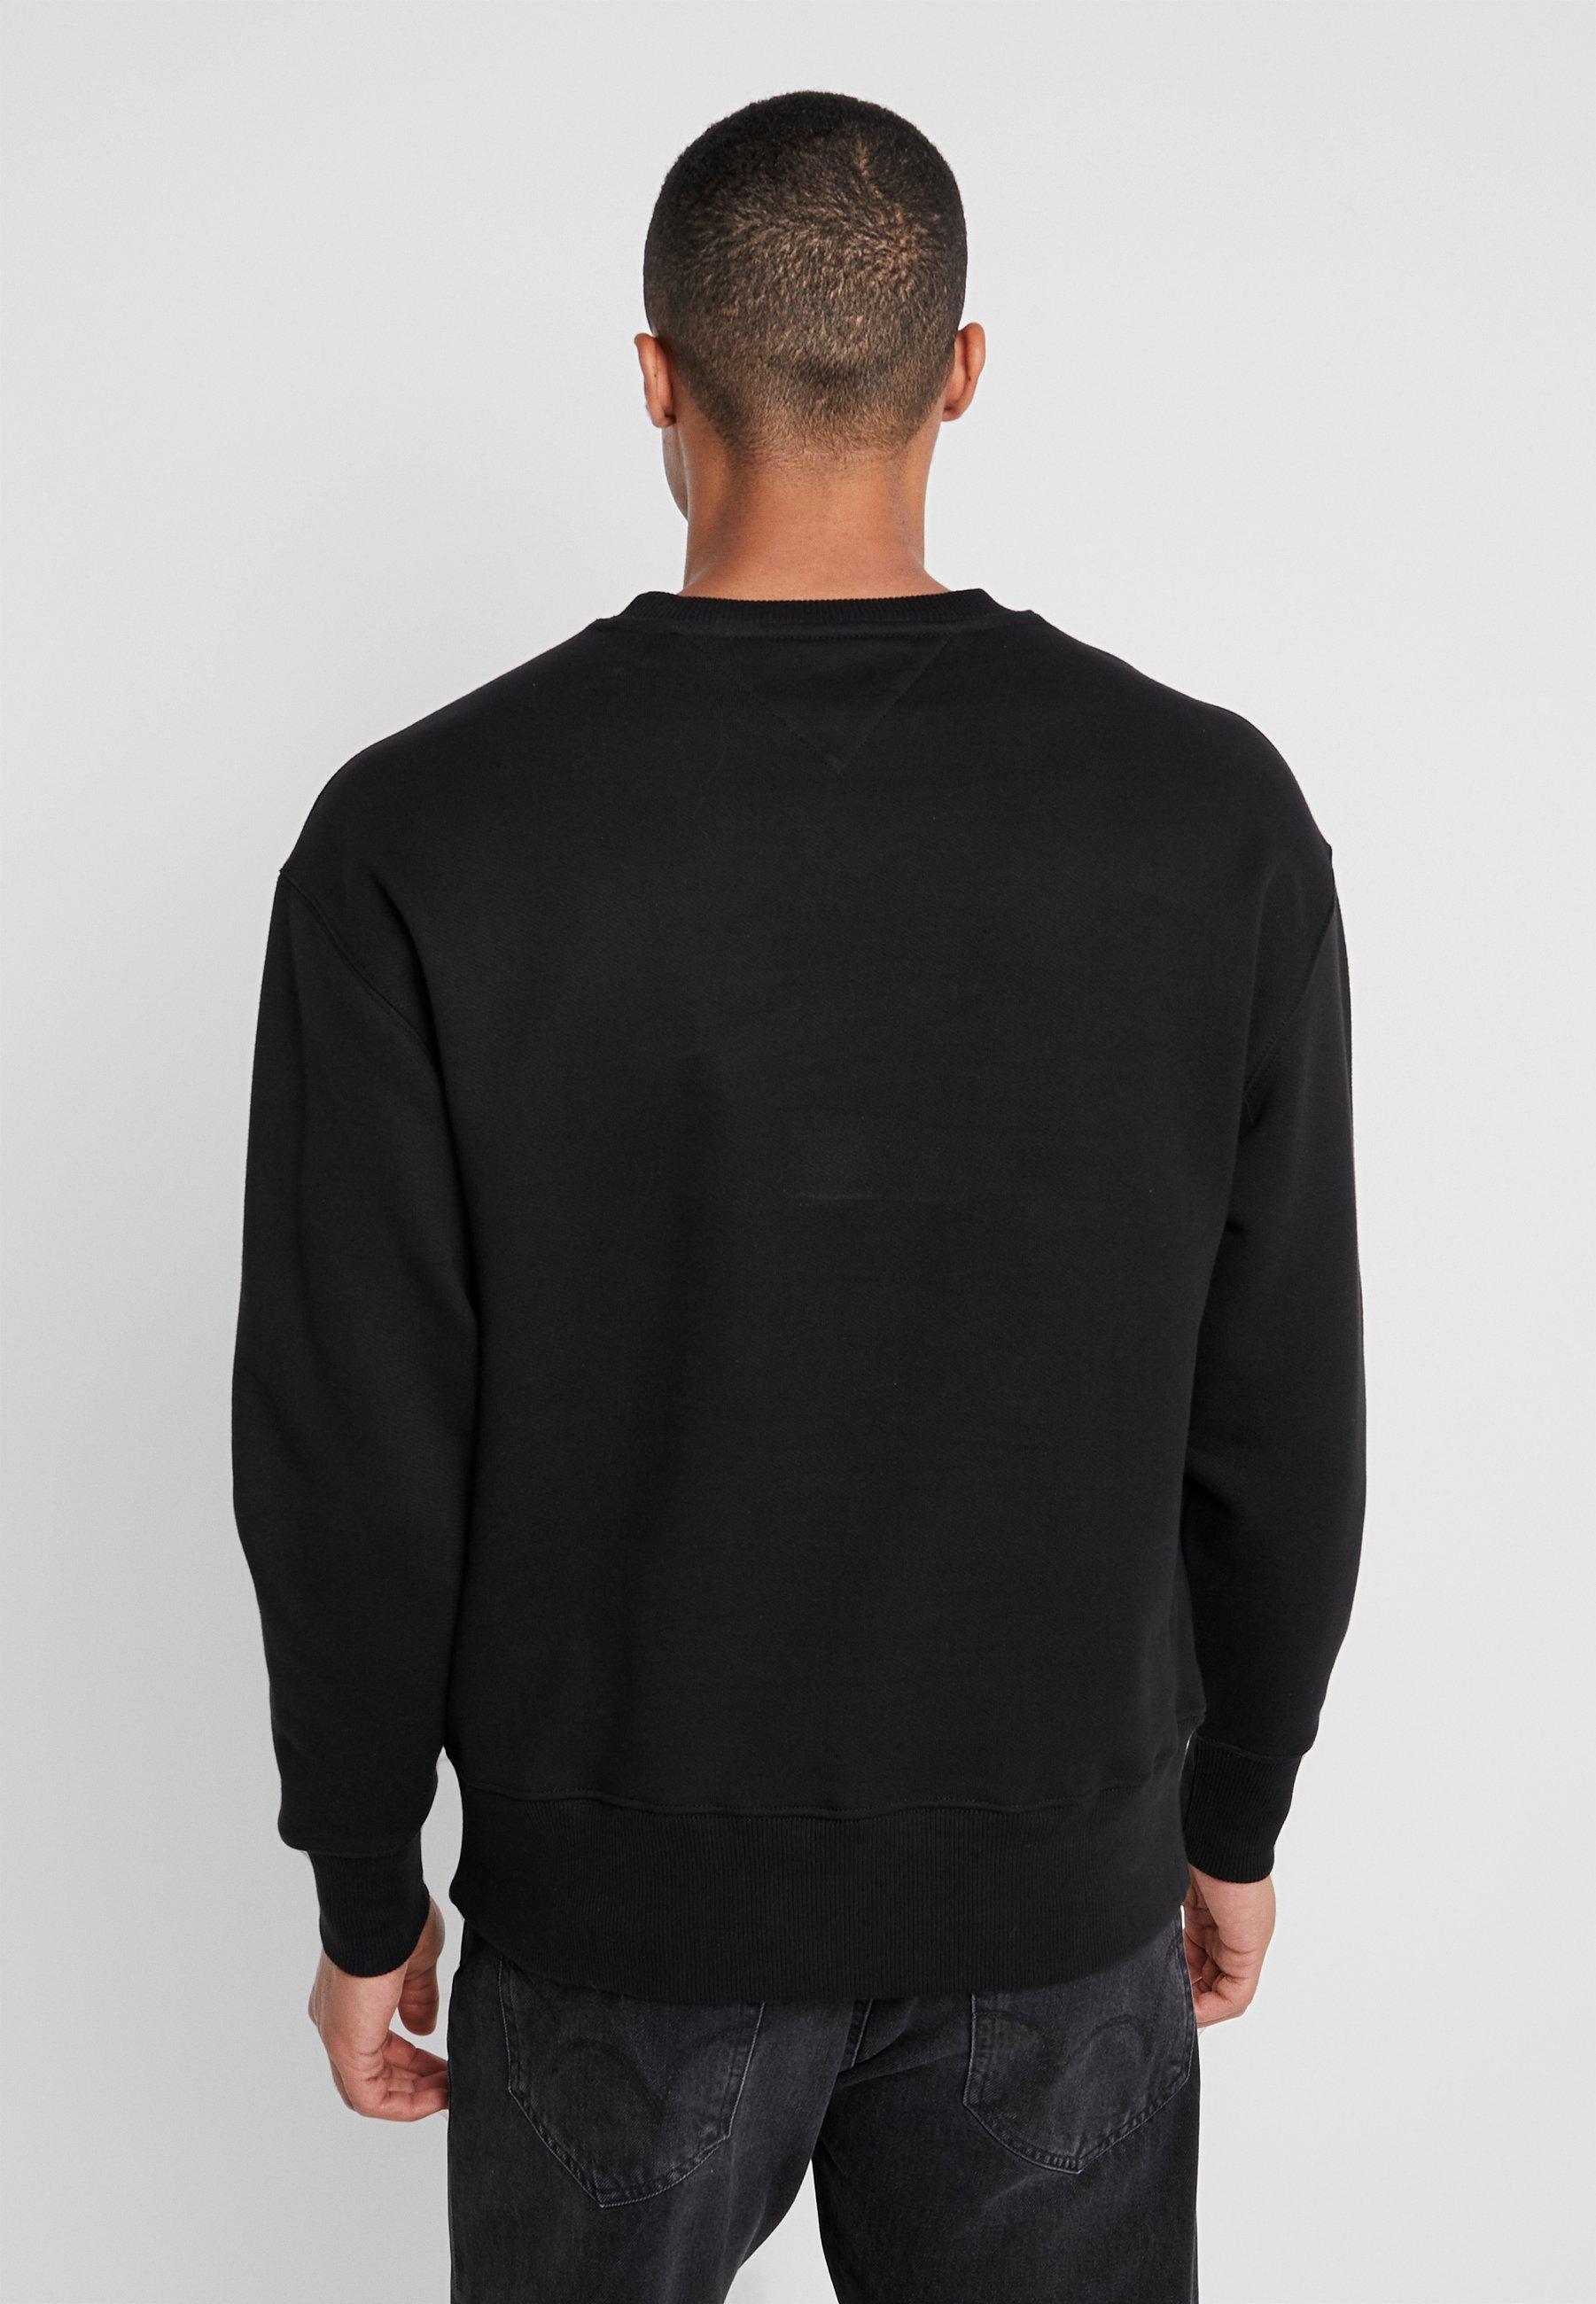 Jeans Jeans Tommy Tommy CrewSweatshirt Badge Black Badge mn0w8N